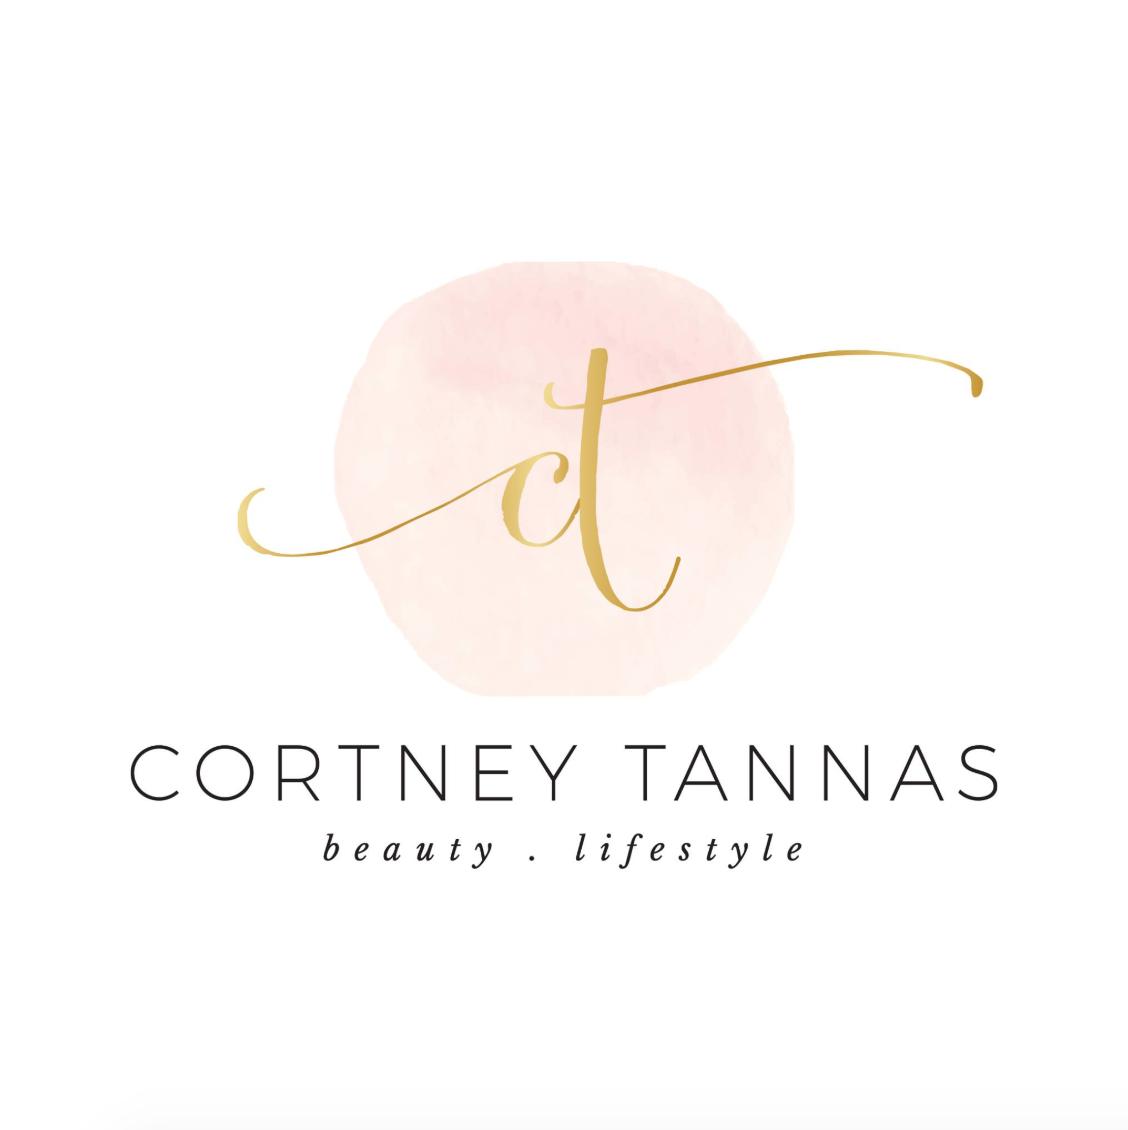 Cortney Tannas Boutique